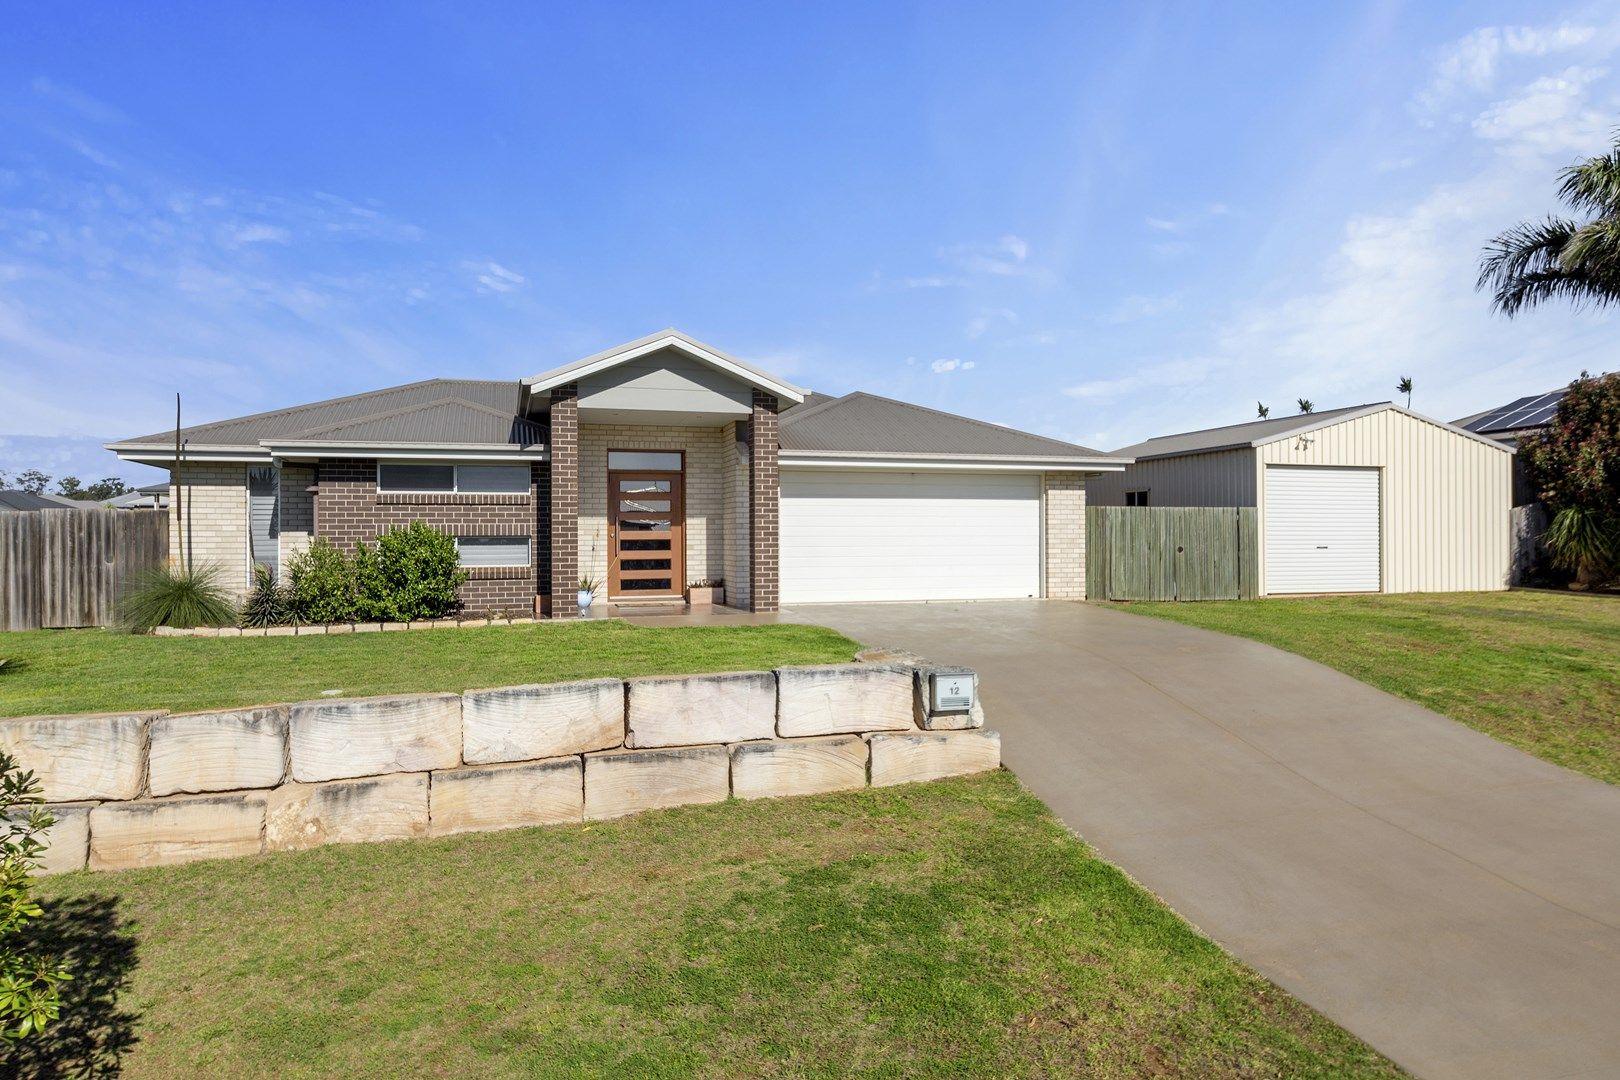 12 Hendra Court, Kleinton QLD 4352, Image 1